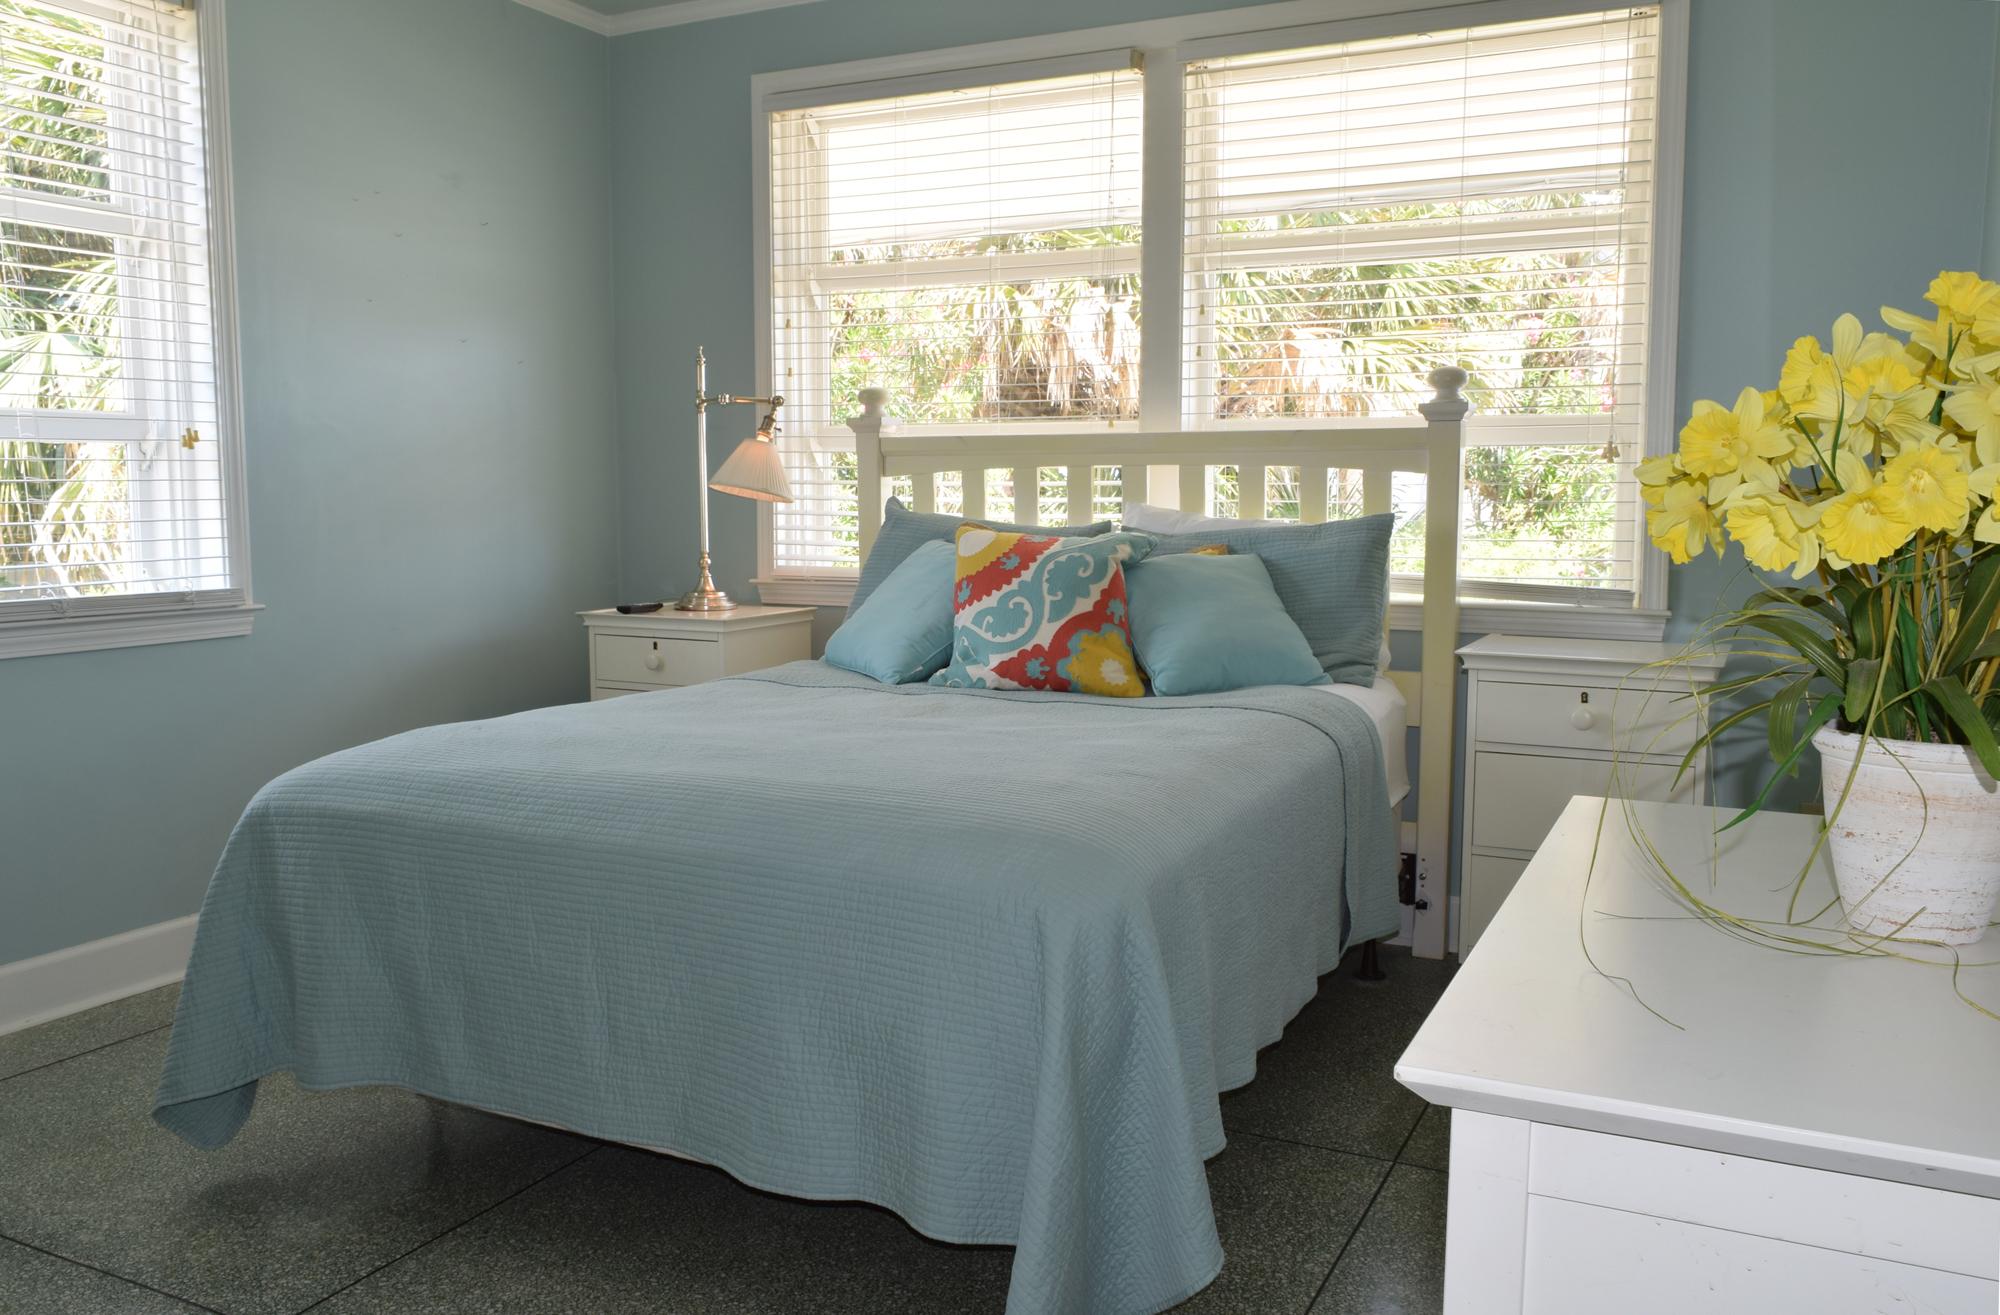 Panferio 603 House/Cottage rental in Pensacola Beach House Rentals in Pensacola Beach Florida - #15